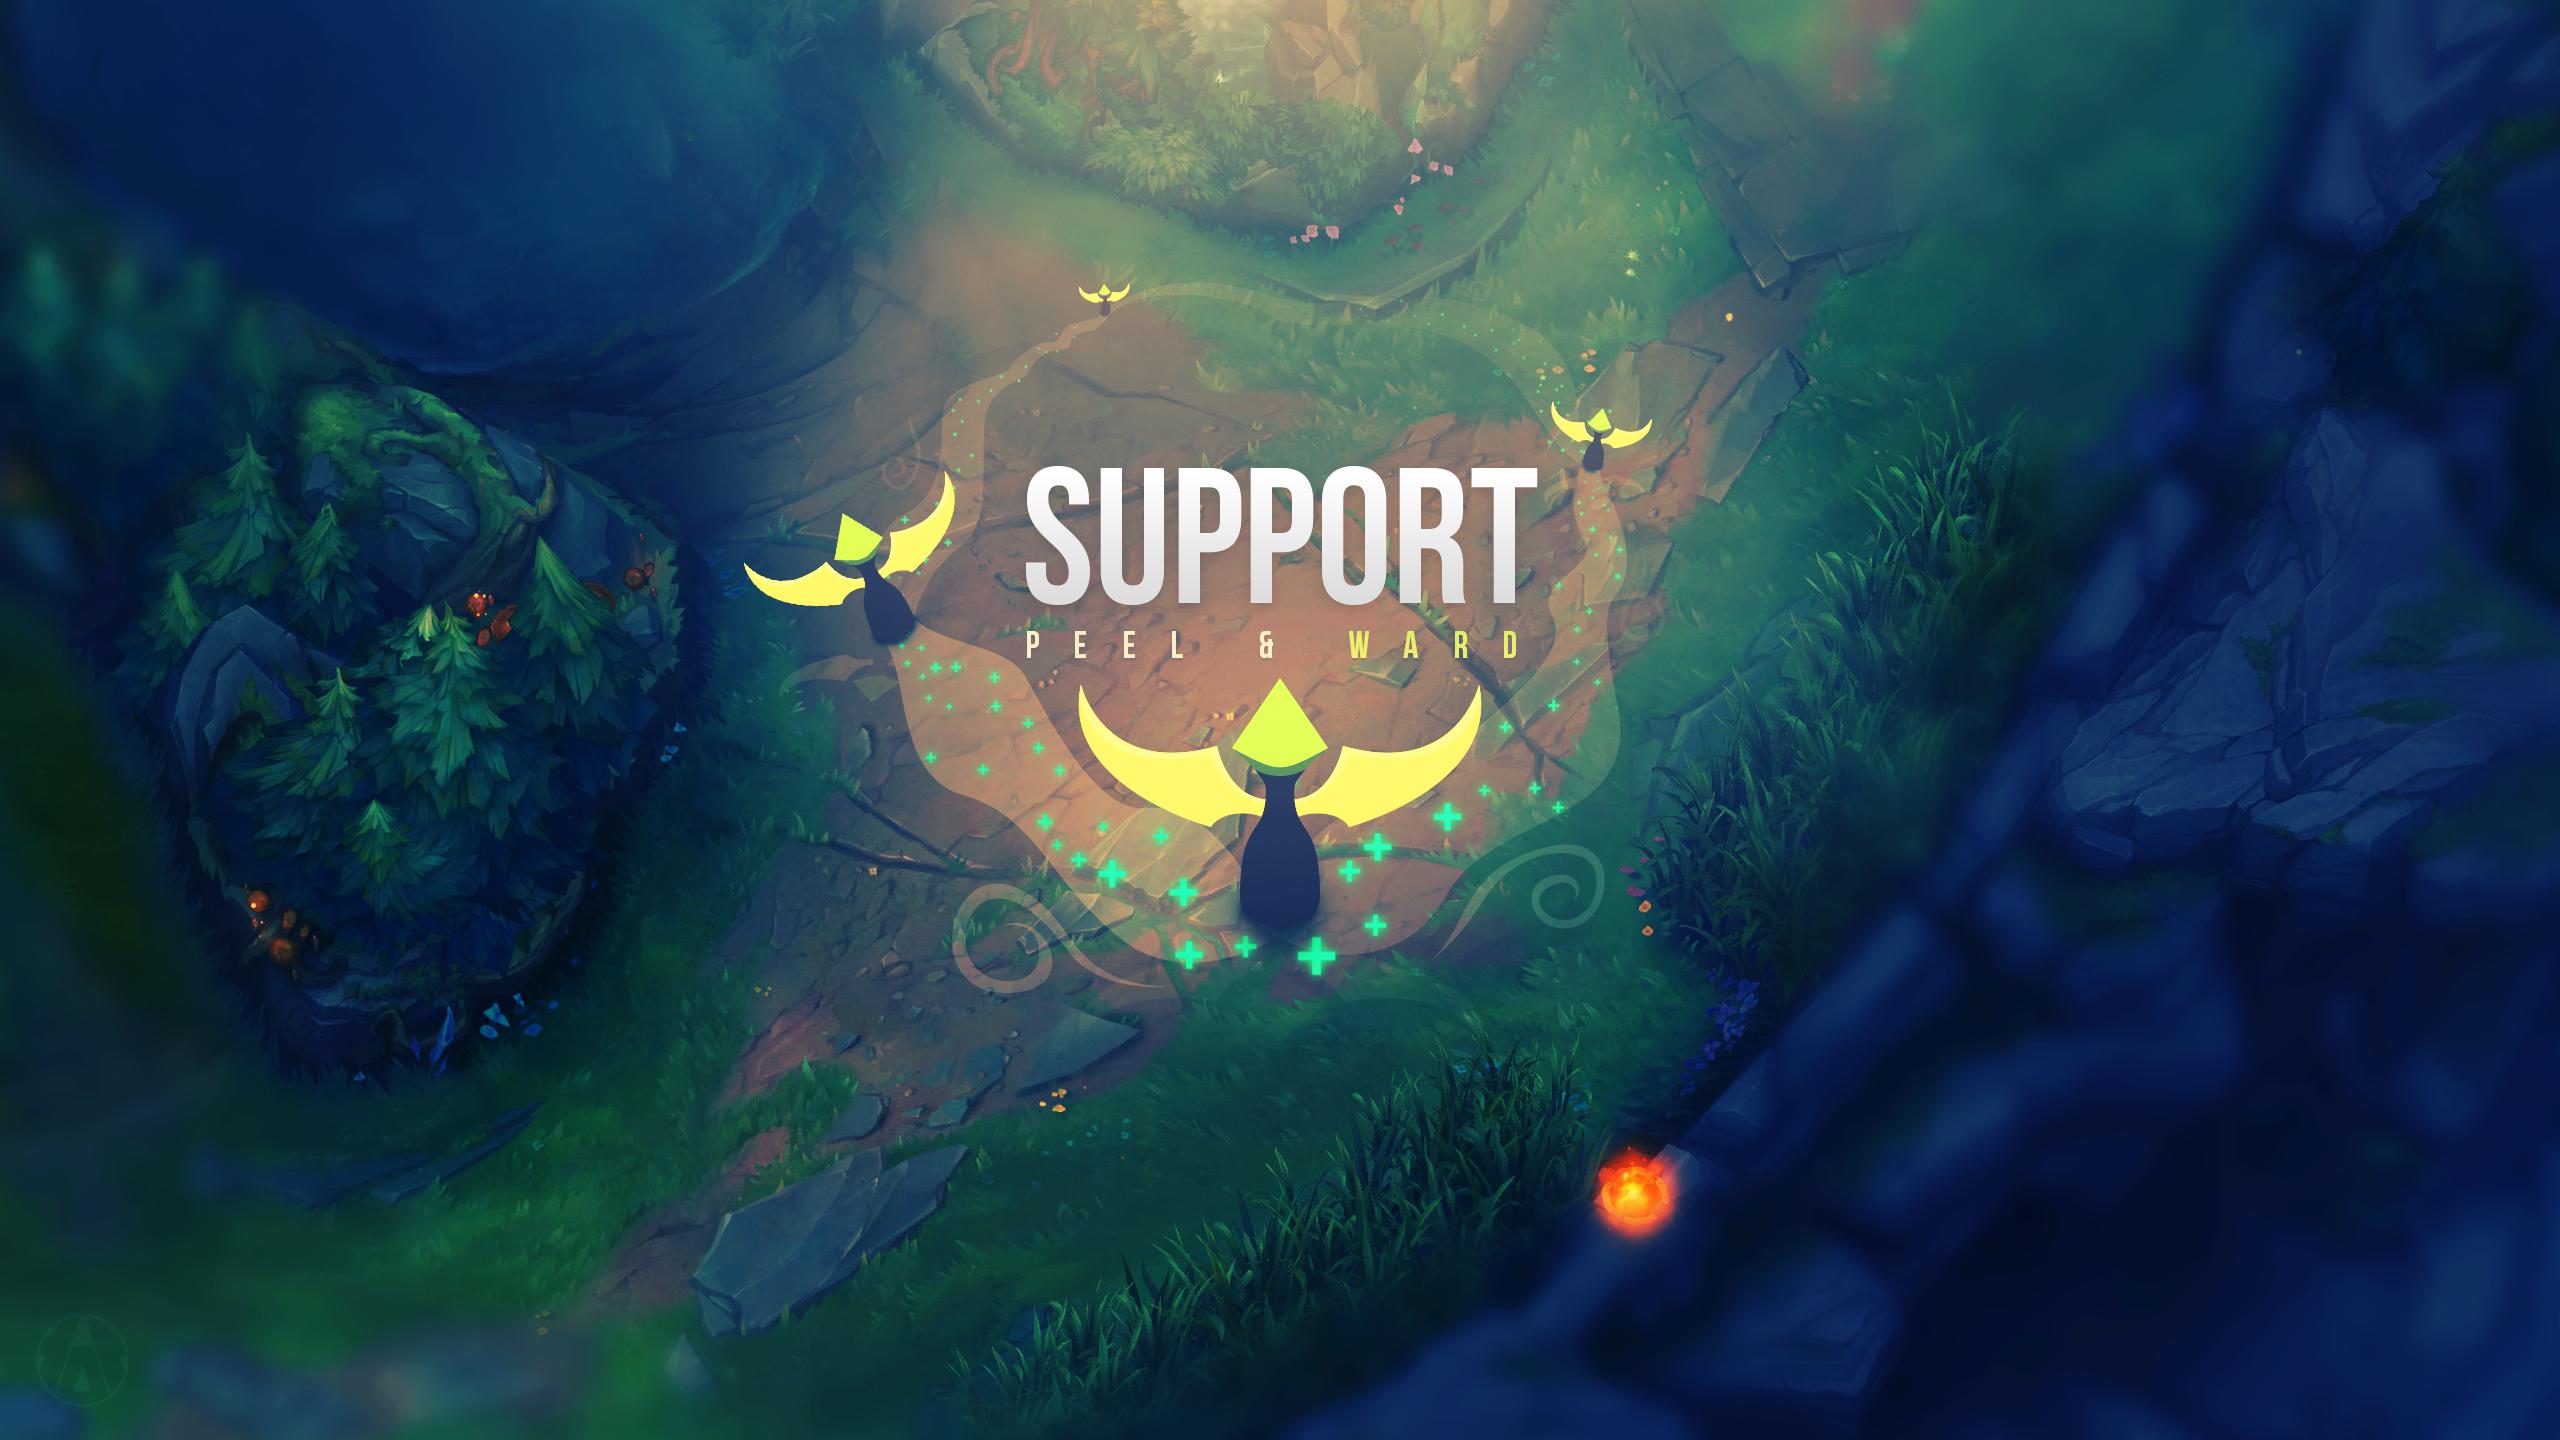 Support wallpaper